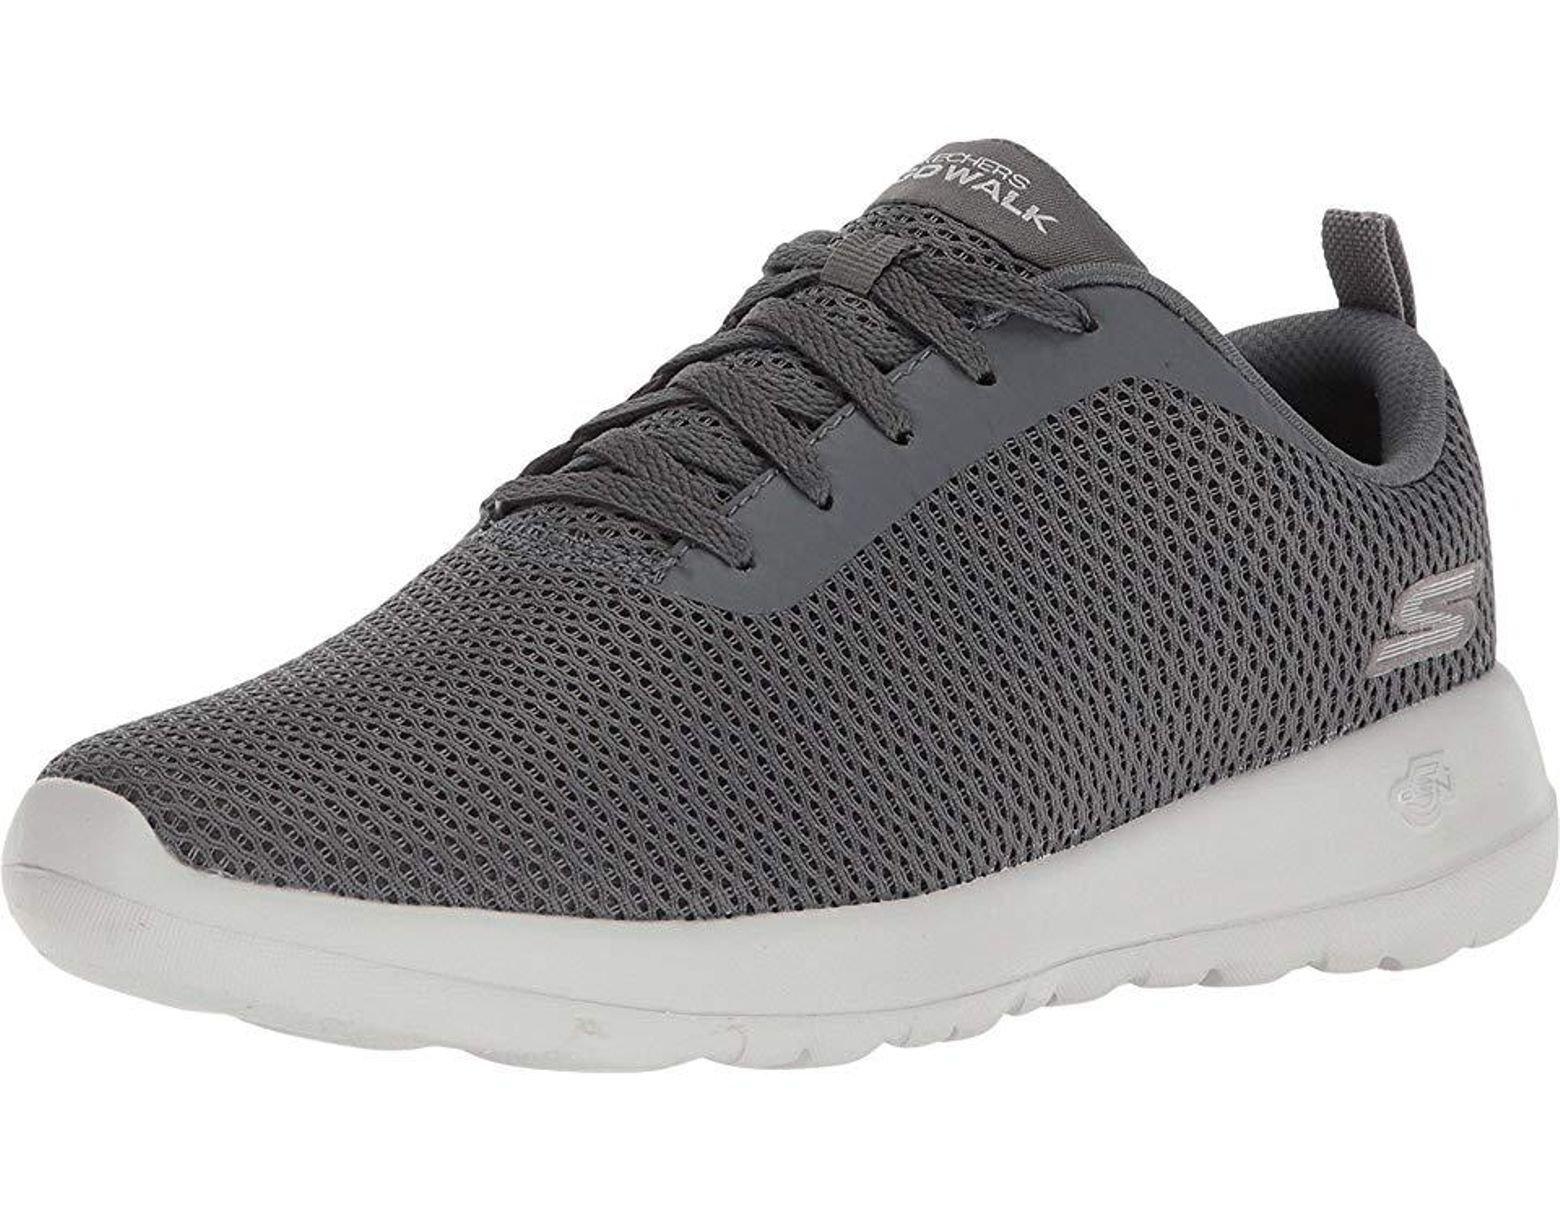 c3402ff9b6ce6 Skechers Gowalk Joy - Paradise (charcoal) Shoes in Gray - Lyst